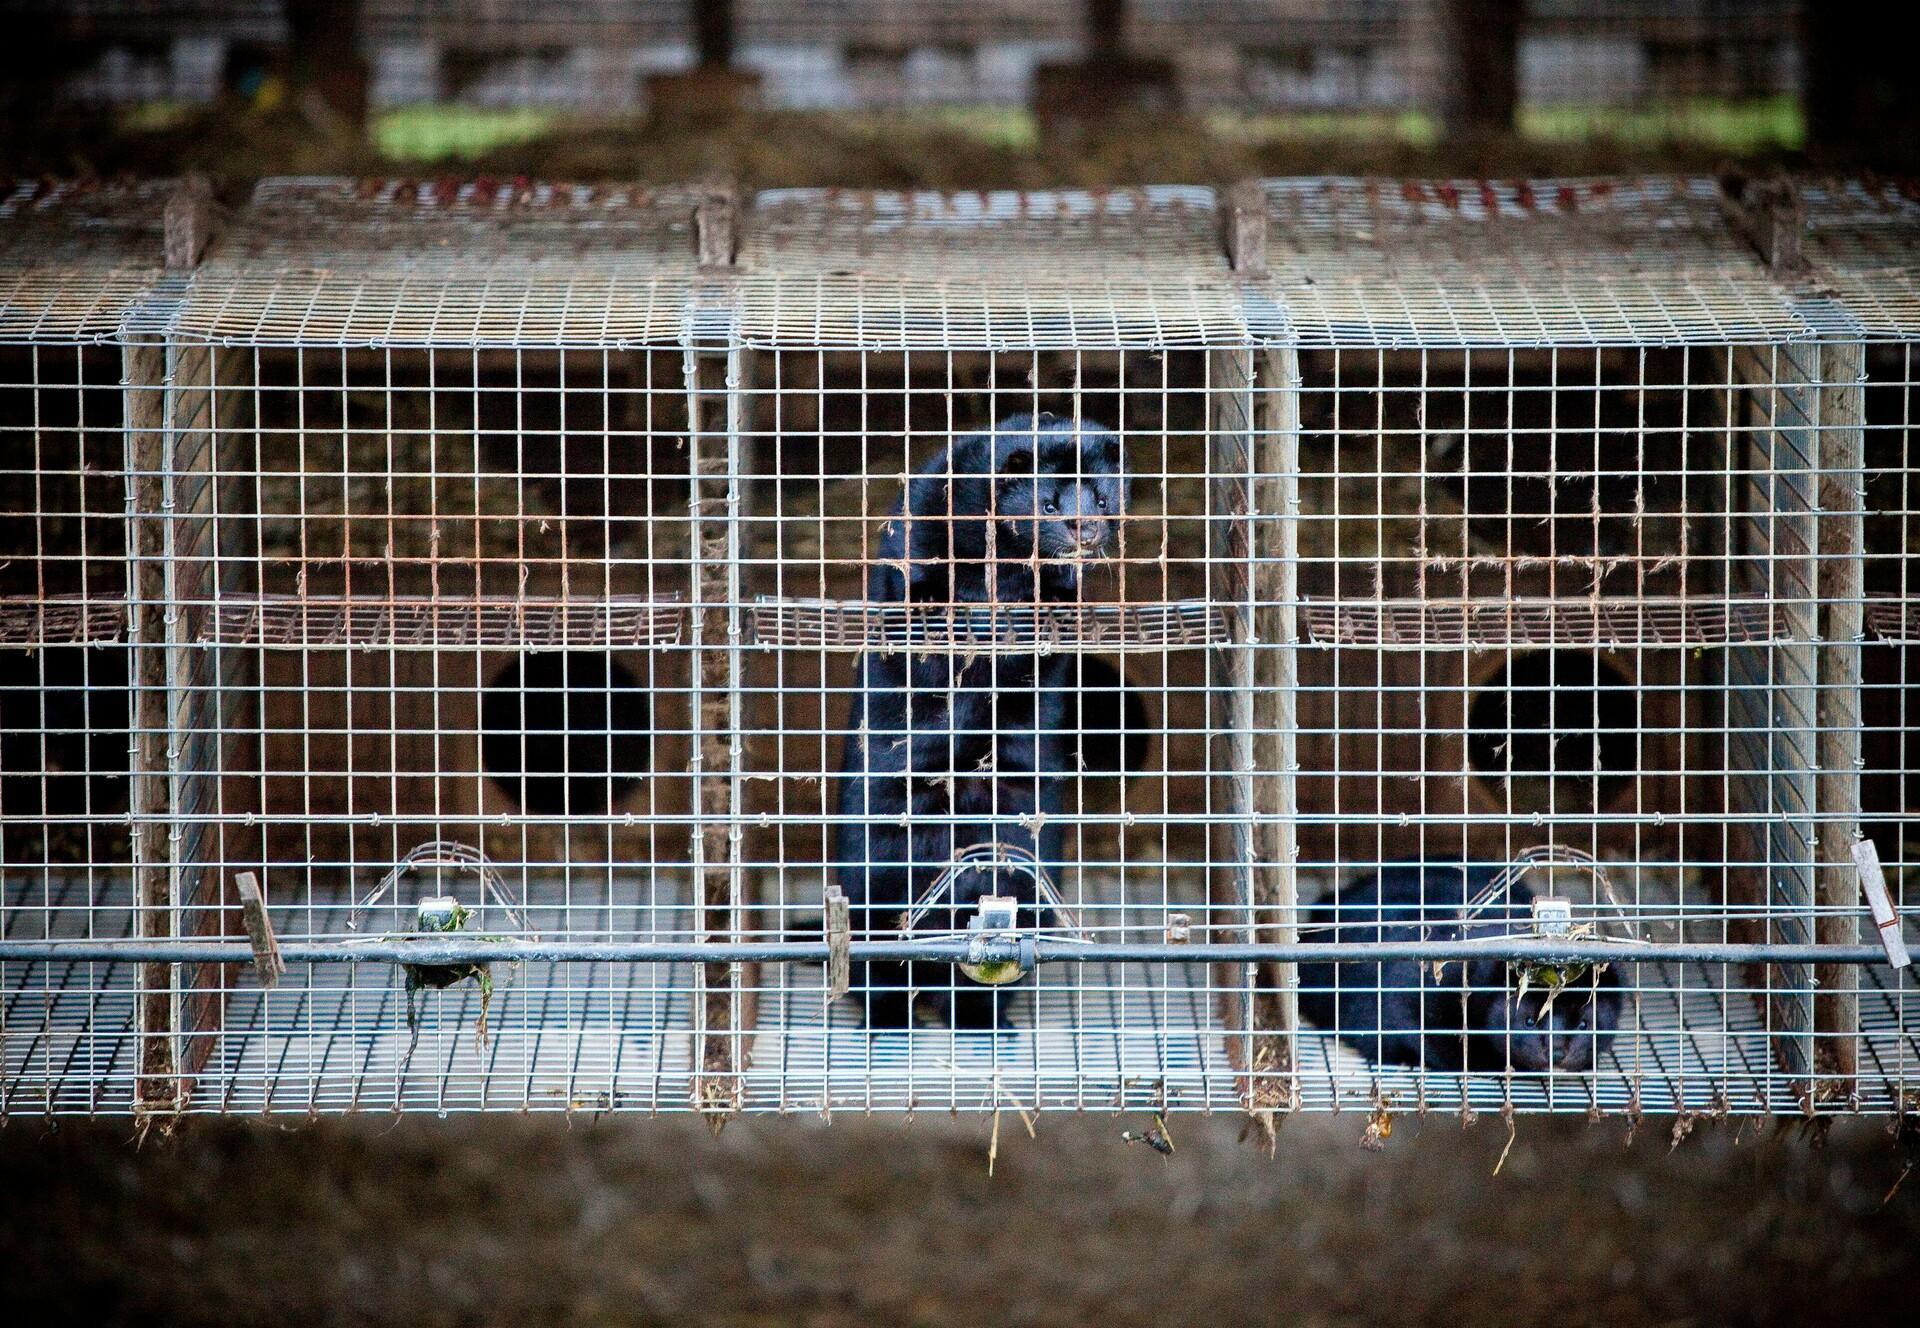 Minks at fur farm in Germany